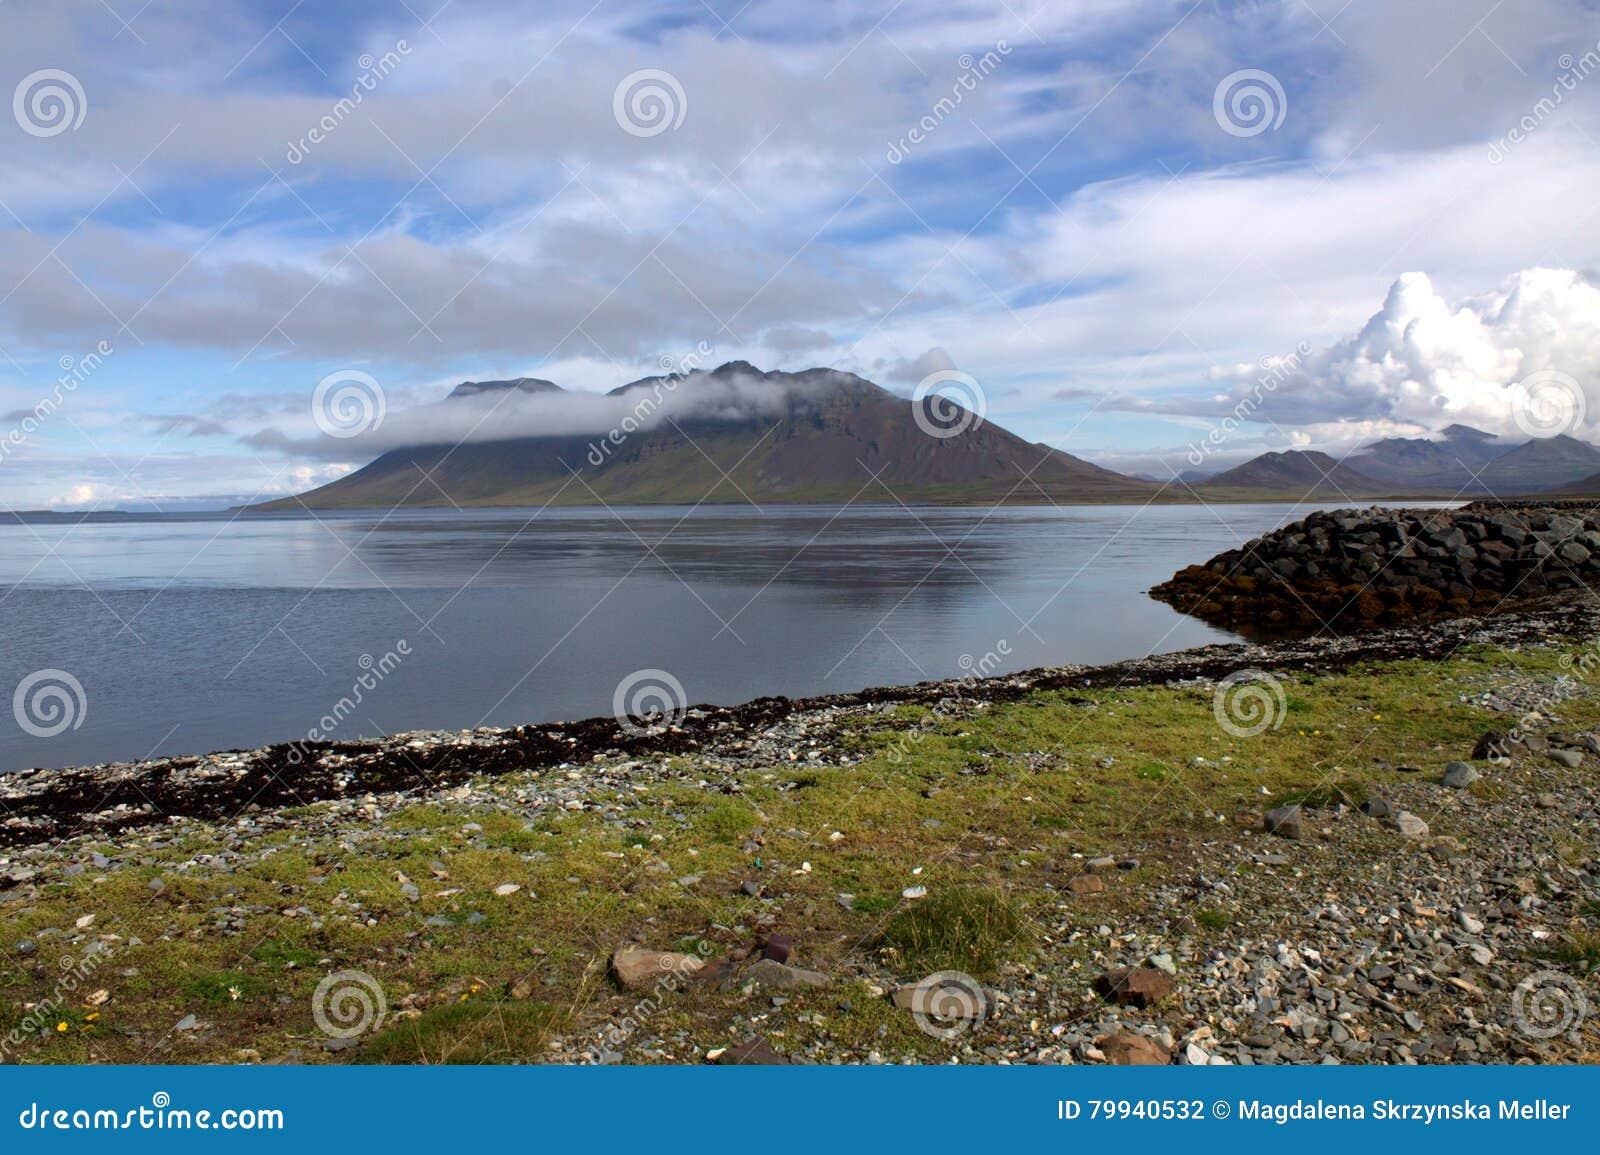 Grundarfjordur Snaefellsnes penisula in Iceland